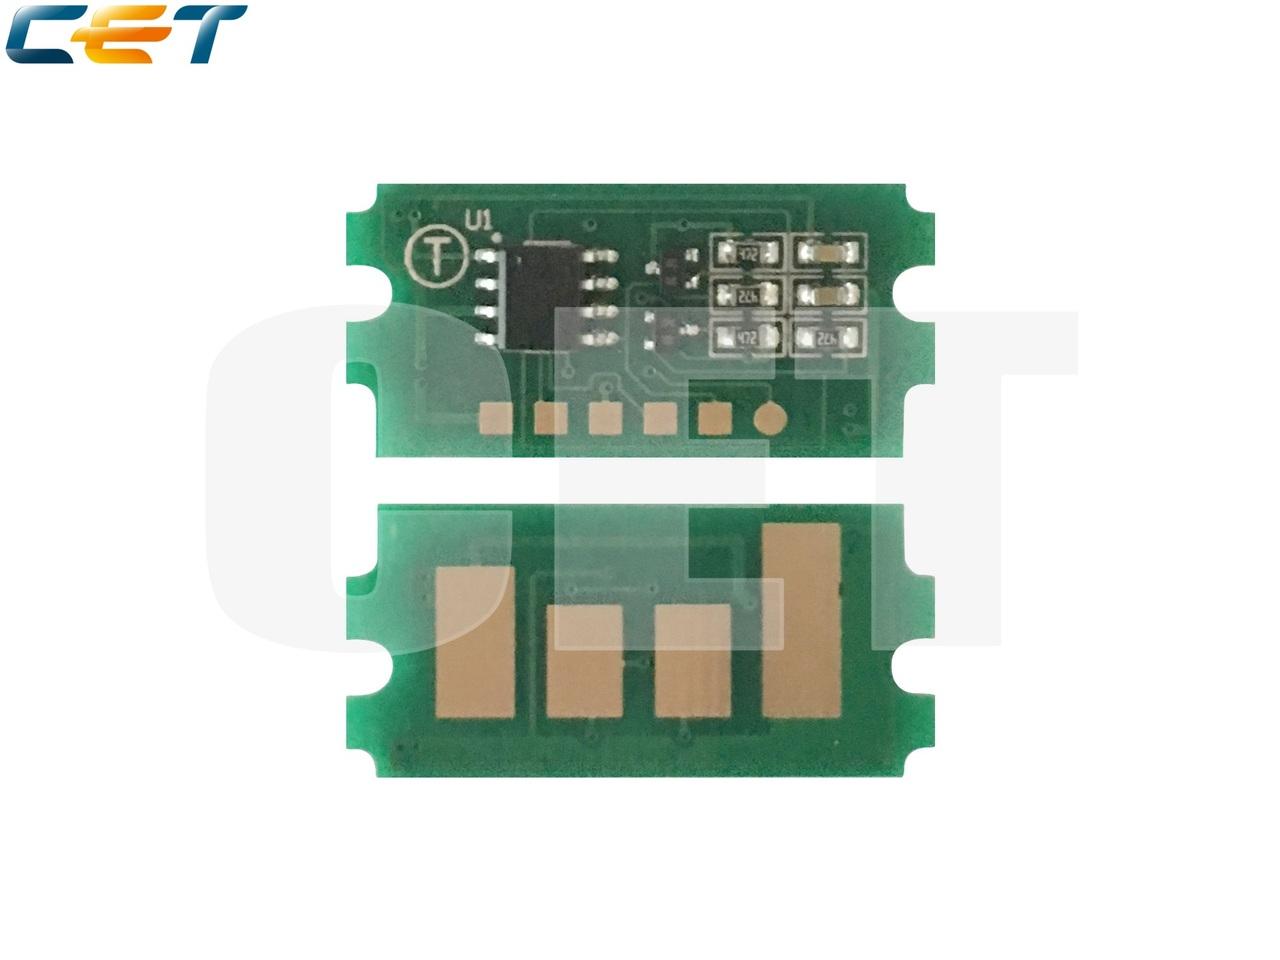 Чип картриджа TK-3150 для KYOCERA EcosysM3040idn/M3540idn (CET), (EUR), 14500 стр., CET9666